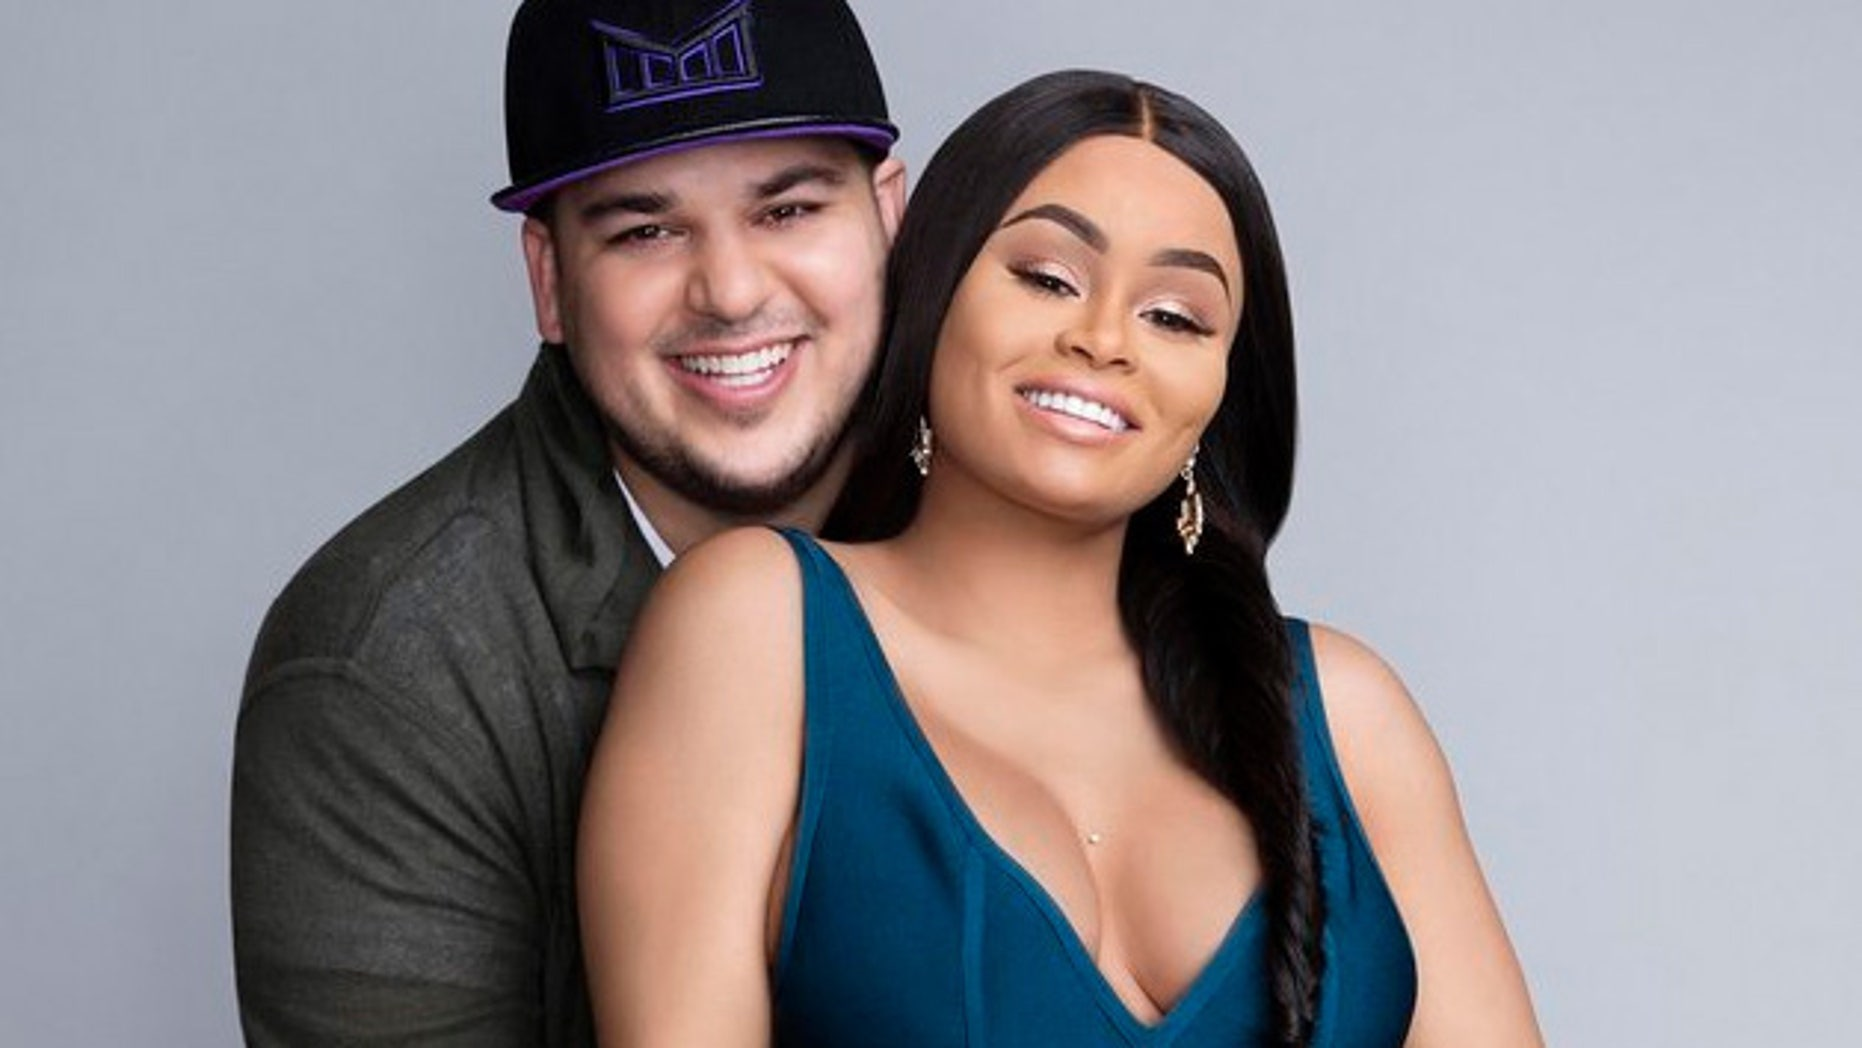 Who is rob kardashian dating 2019